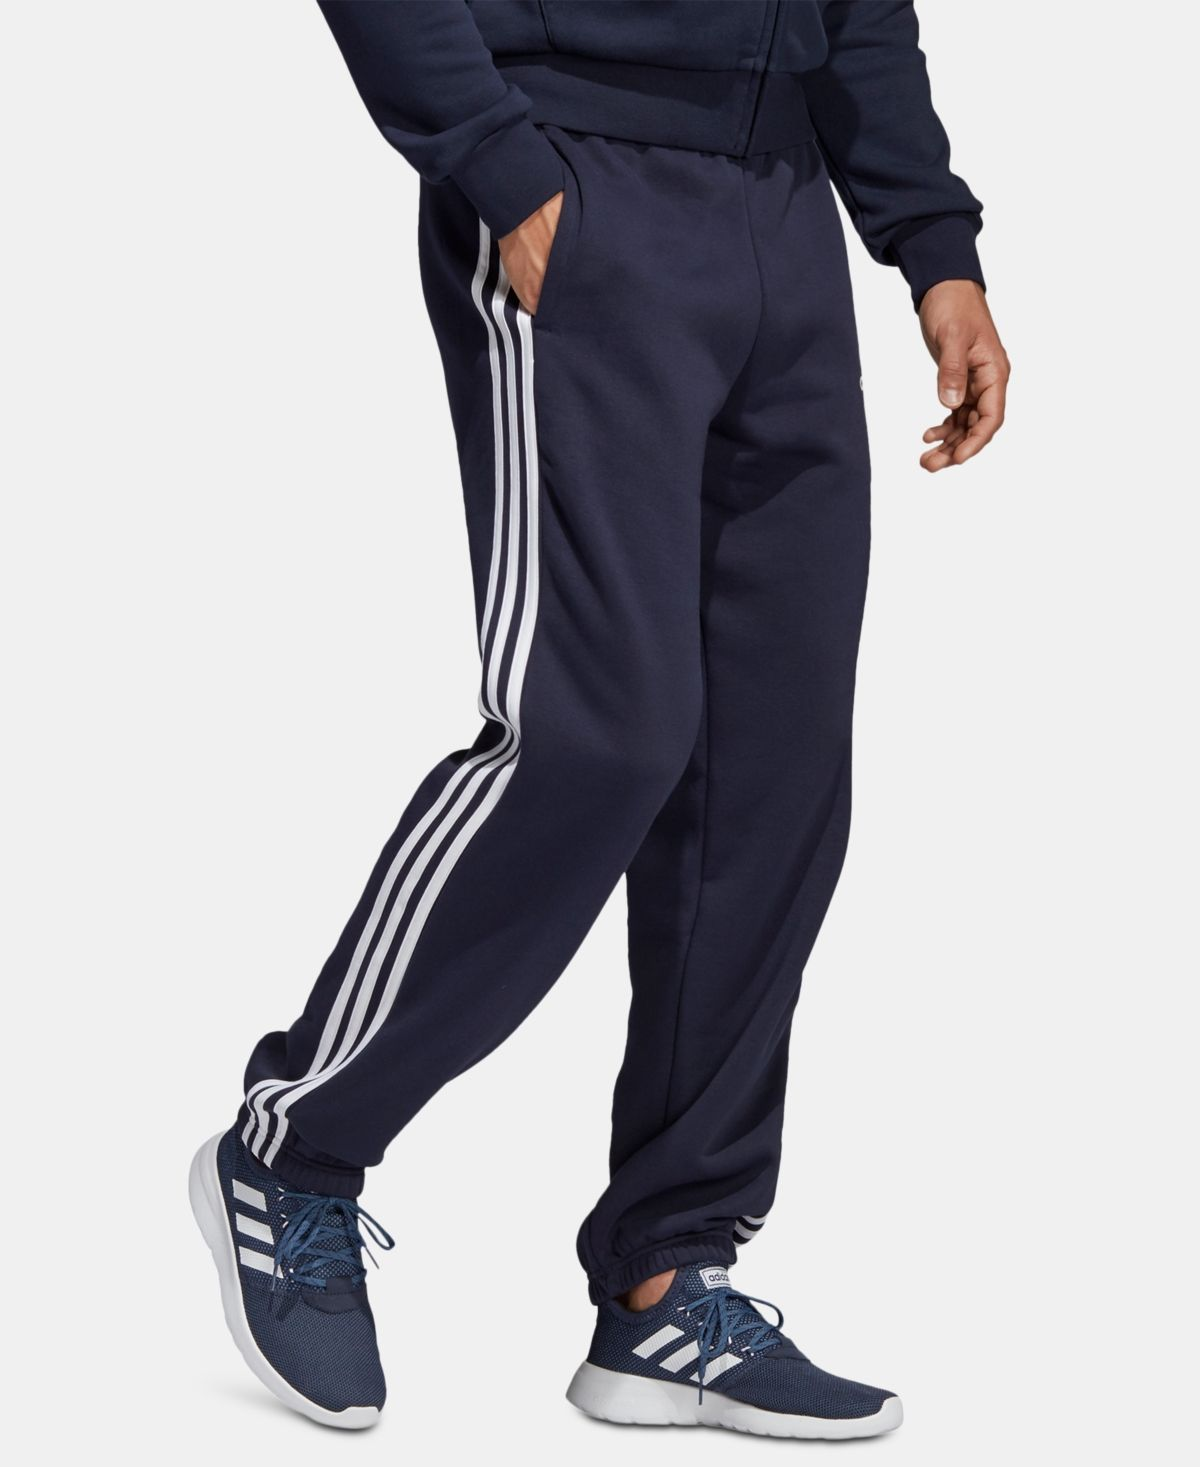 adidas Men's Essentials 3 Stripe Fleece Pants & Reviews